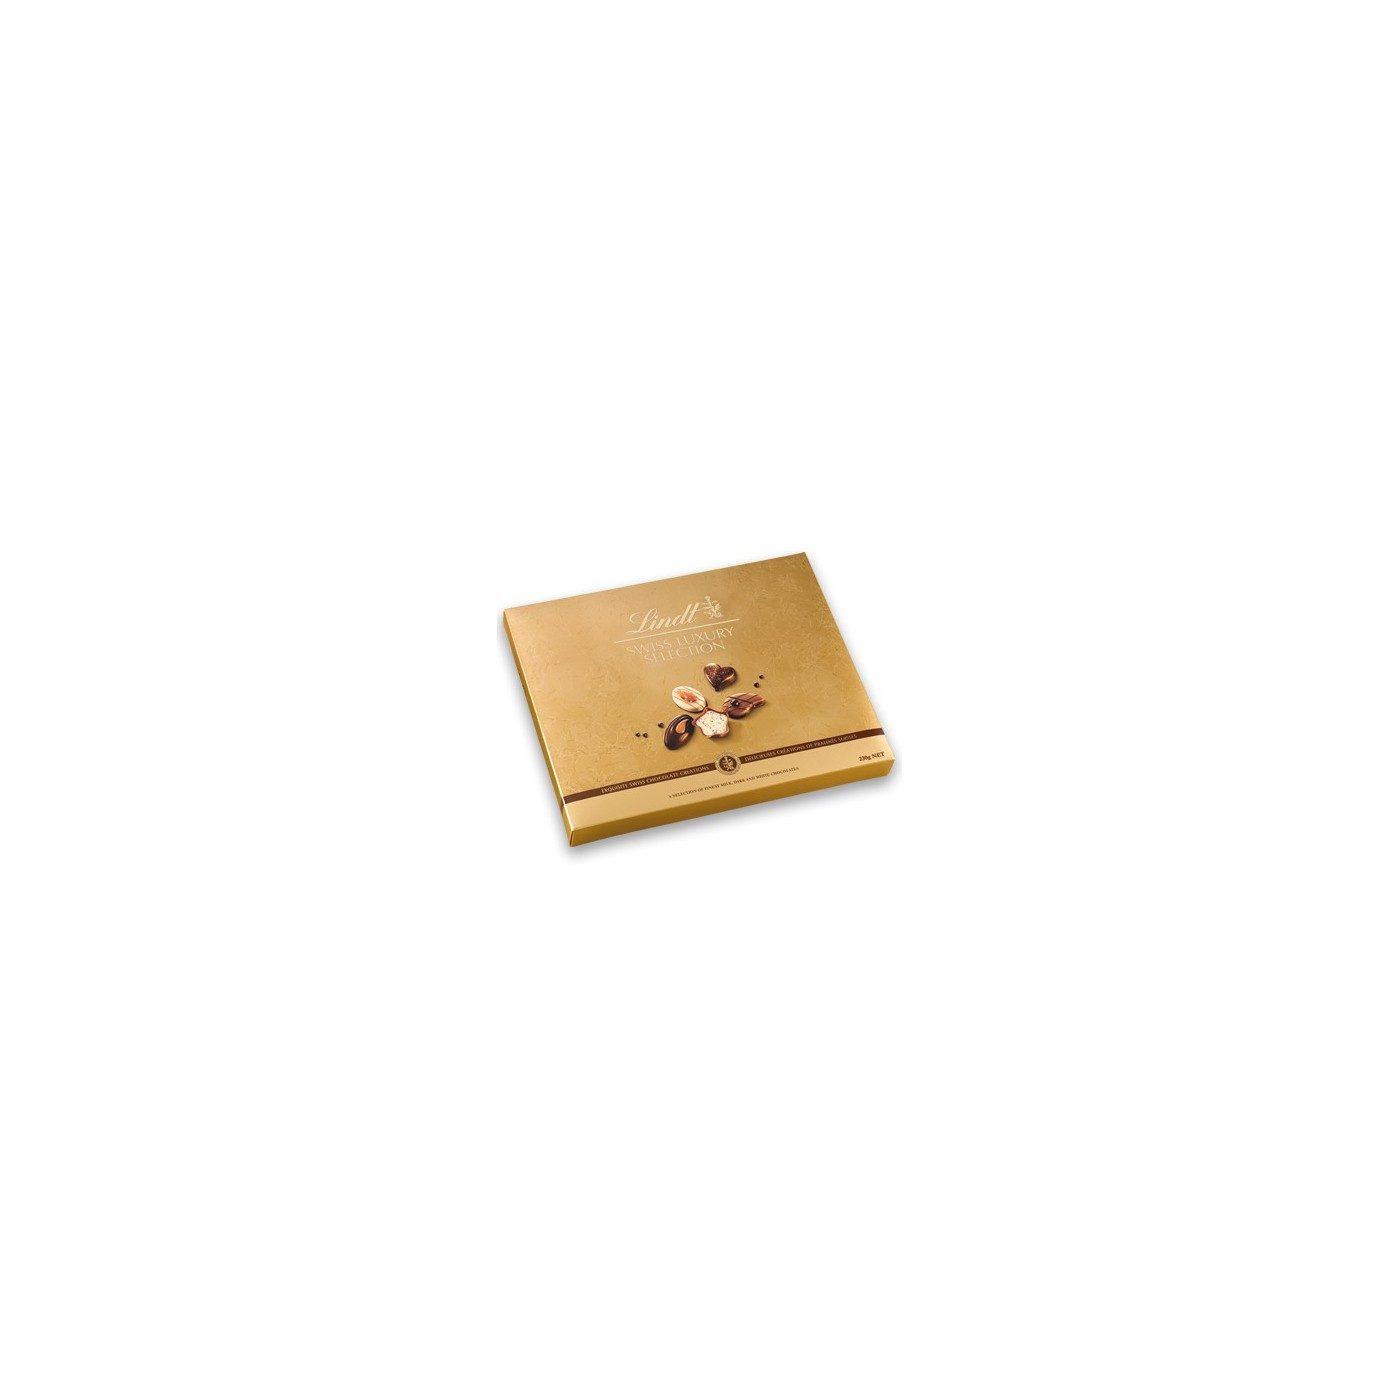 Swiss luxury selection 230g